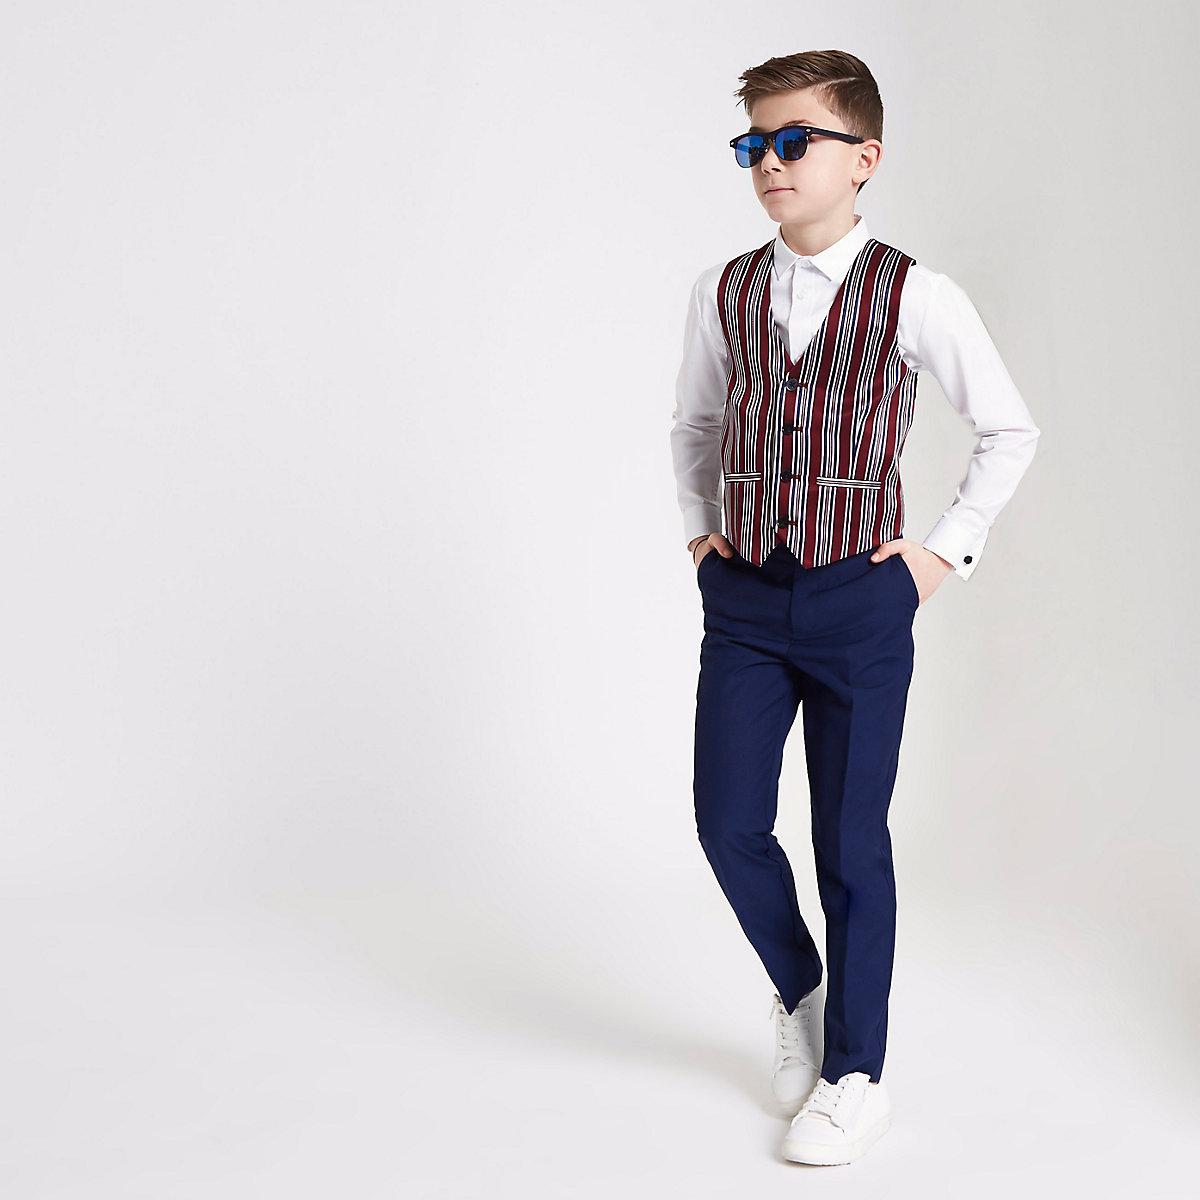 Boys white shirt and stripe vest set